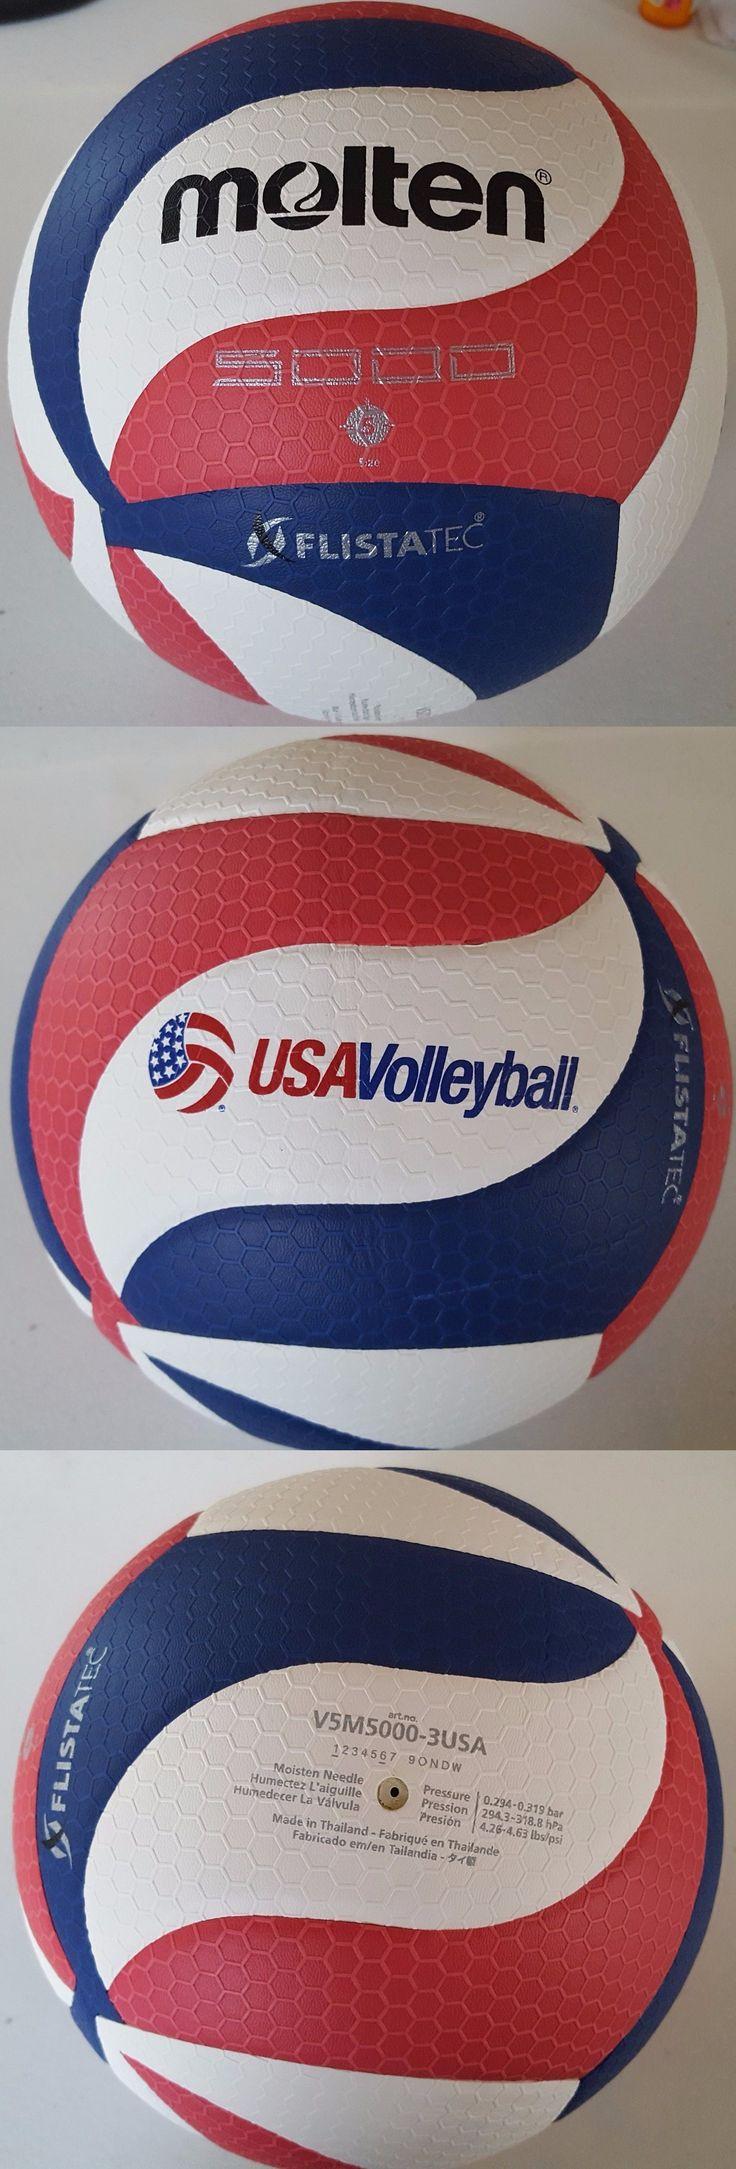 Volleyballs 159132: Molten Flistatec Volleyball - Official Volleyball Of Usa Volleyball, Red/Whit... -> BUY IT NOW ONLY: $62.99 on eBay!